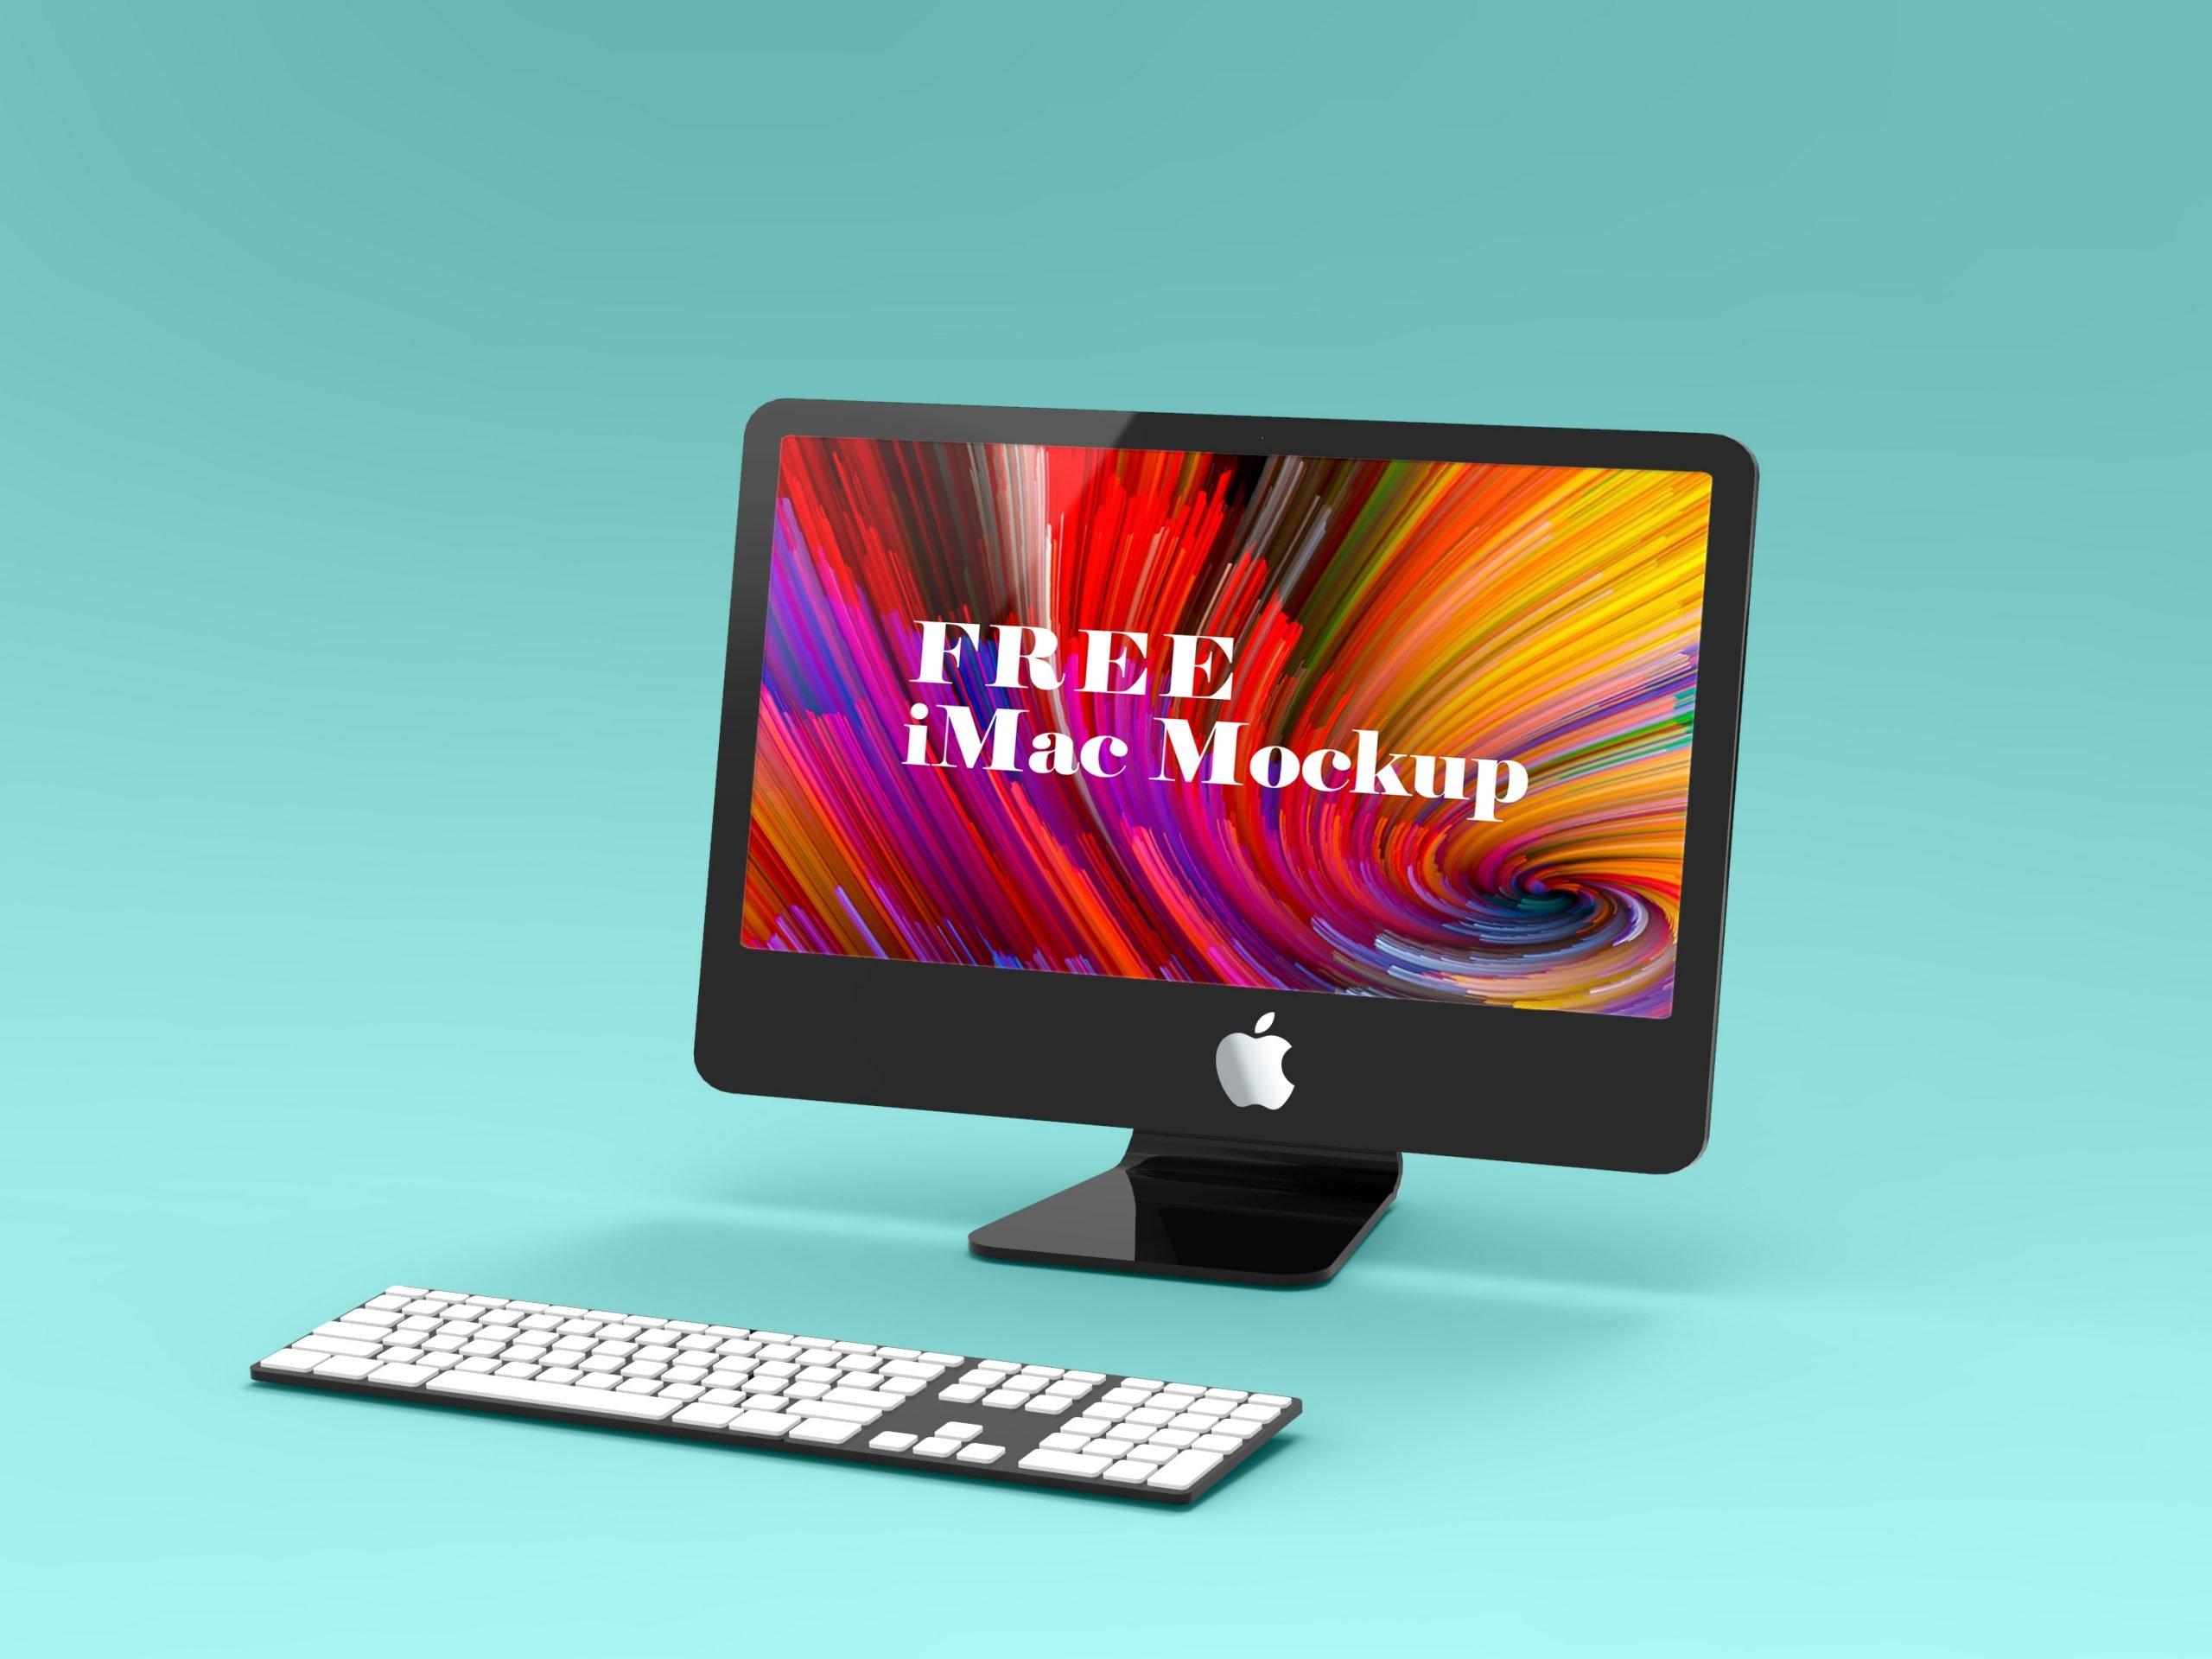 Download-Free-iMac-Mockup